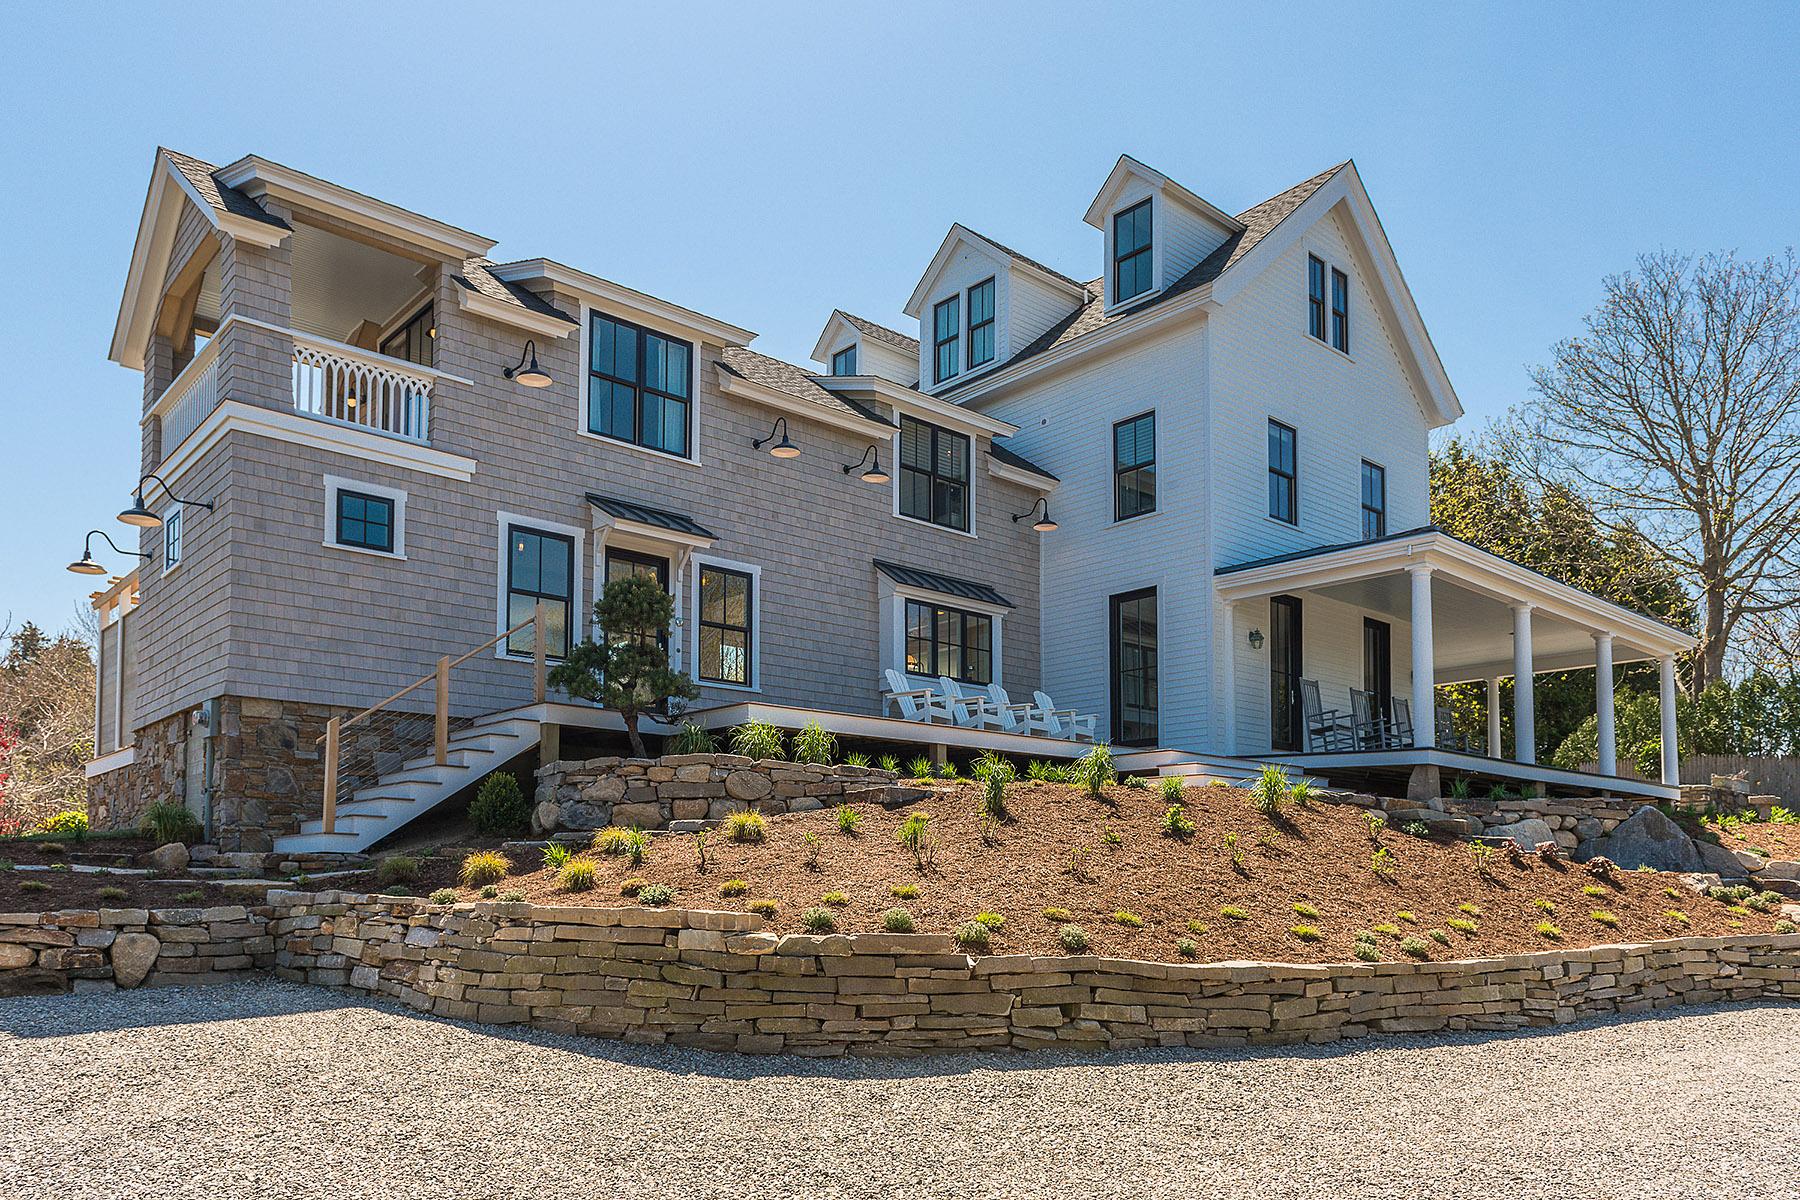 Villa per Vendita alle ore Greycote 18 Wauwinnet Avenue Watch Hill Village Westerly, Rhode Island 02891 Stati Uniti